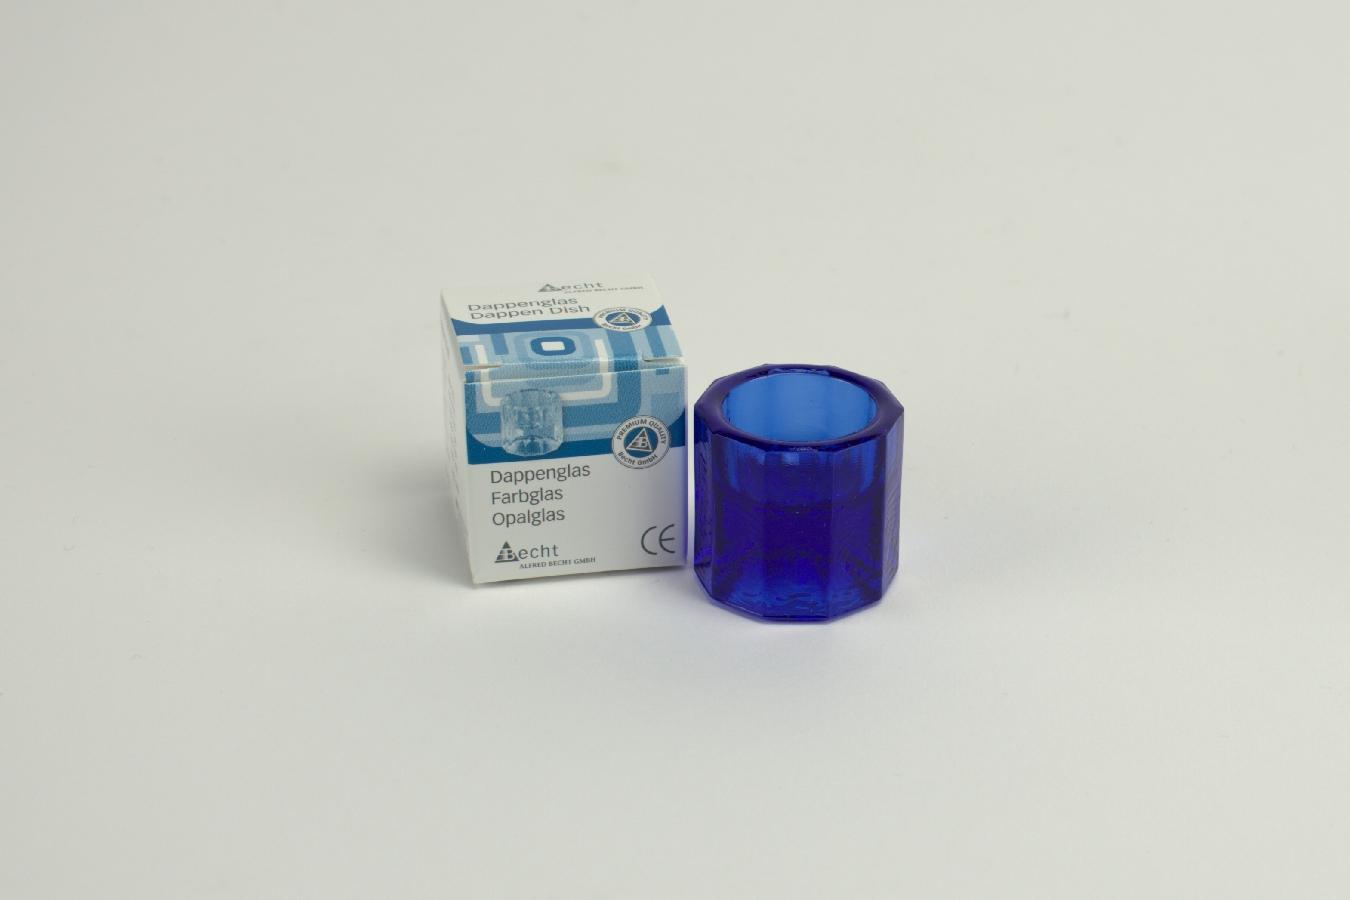 Dappenglas 787 blau St